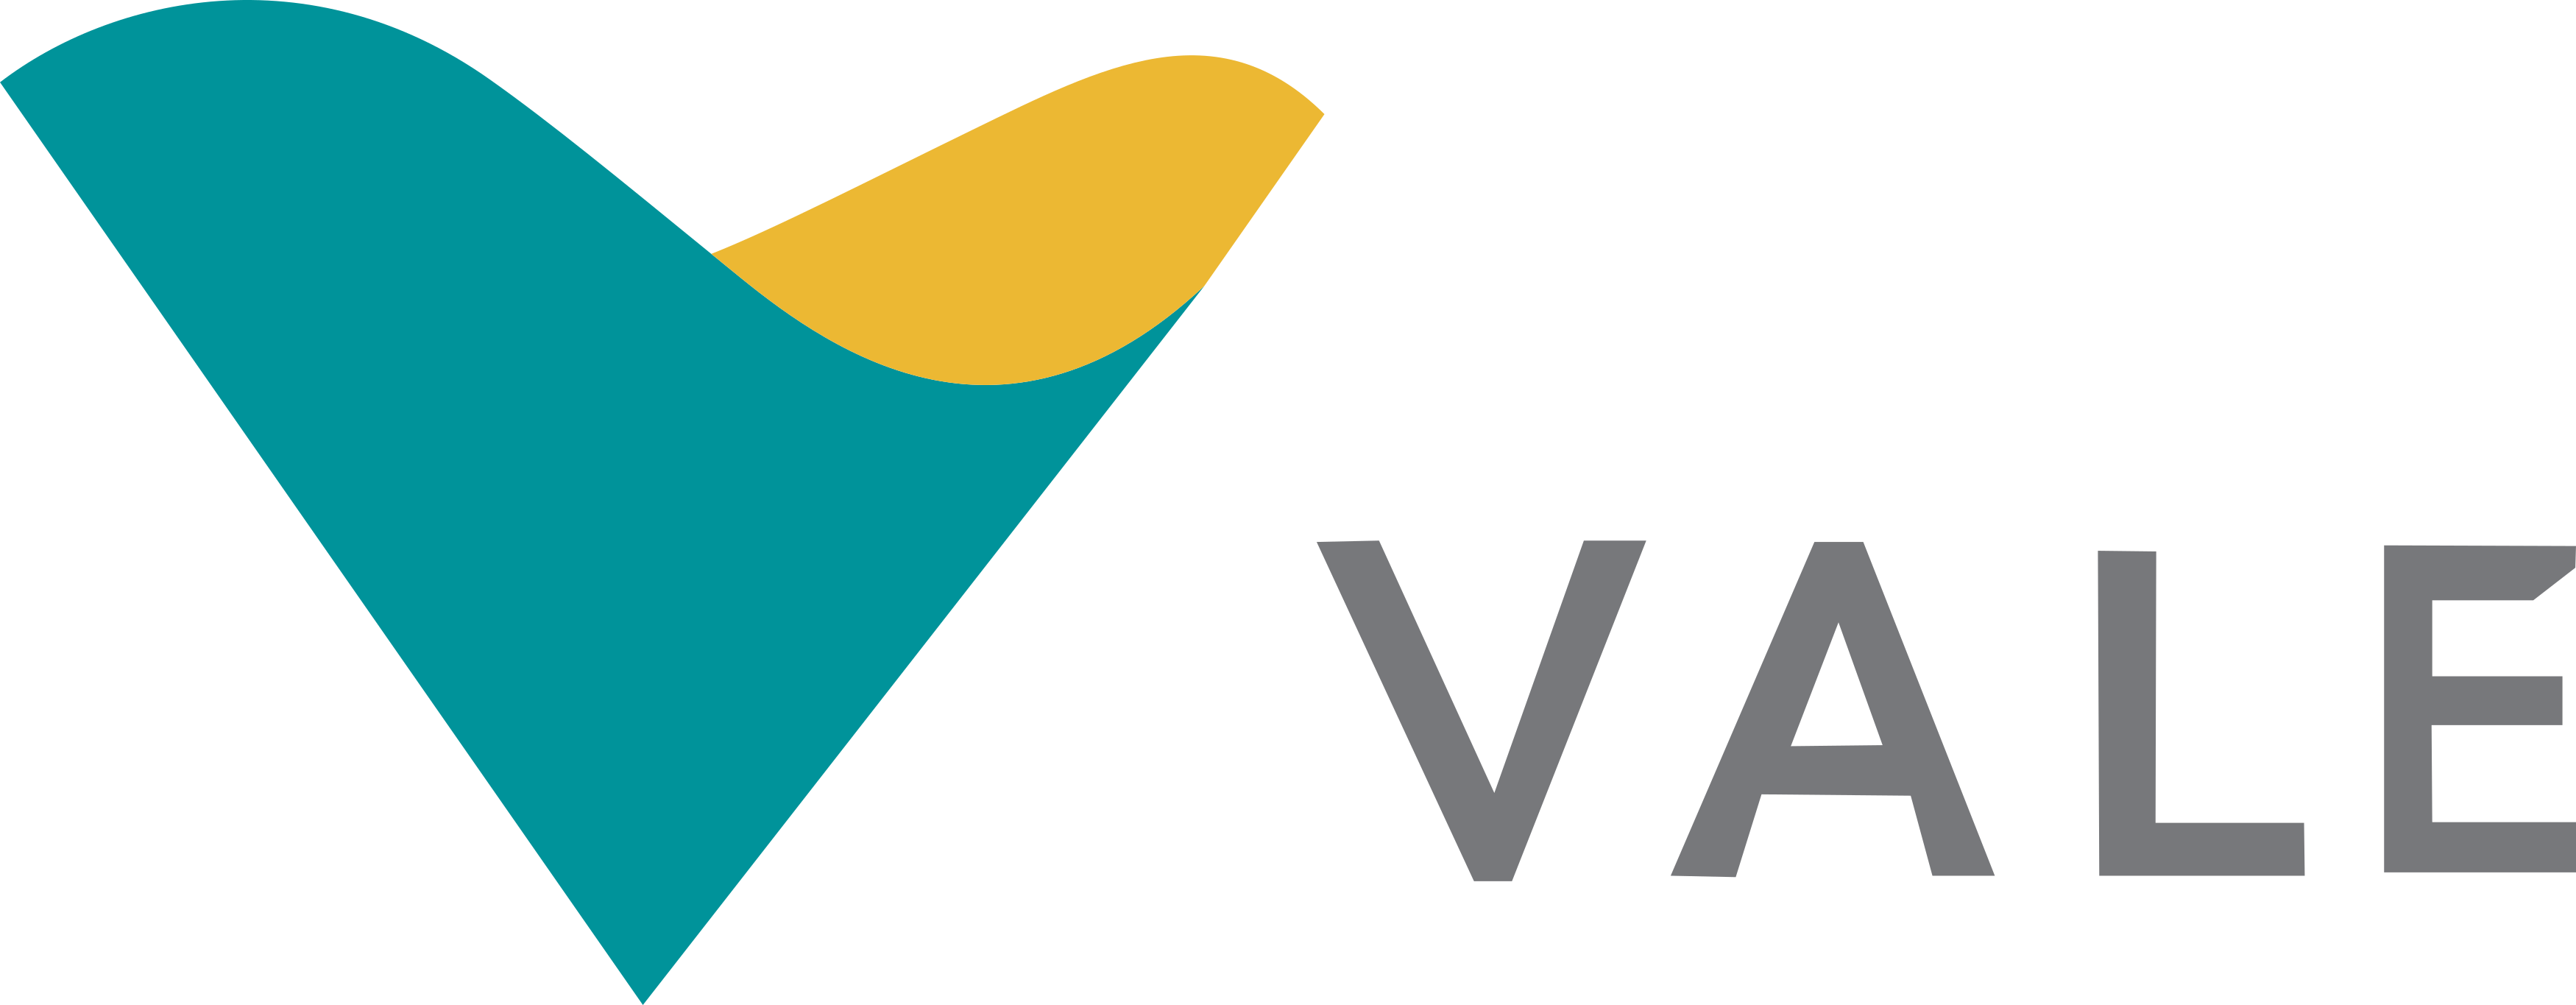 vale logo 1 - Vale Logo - Mineradora